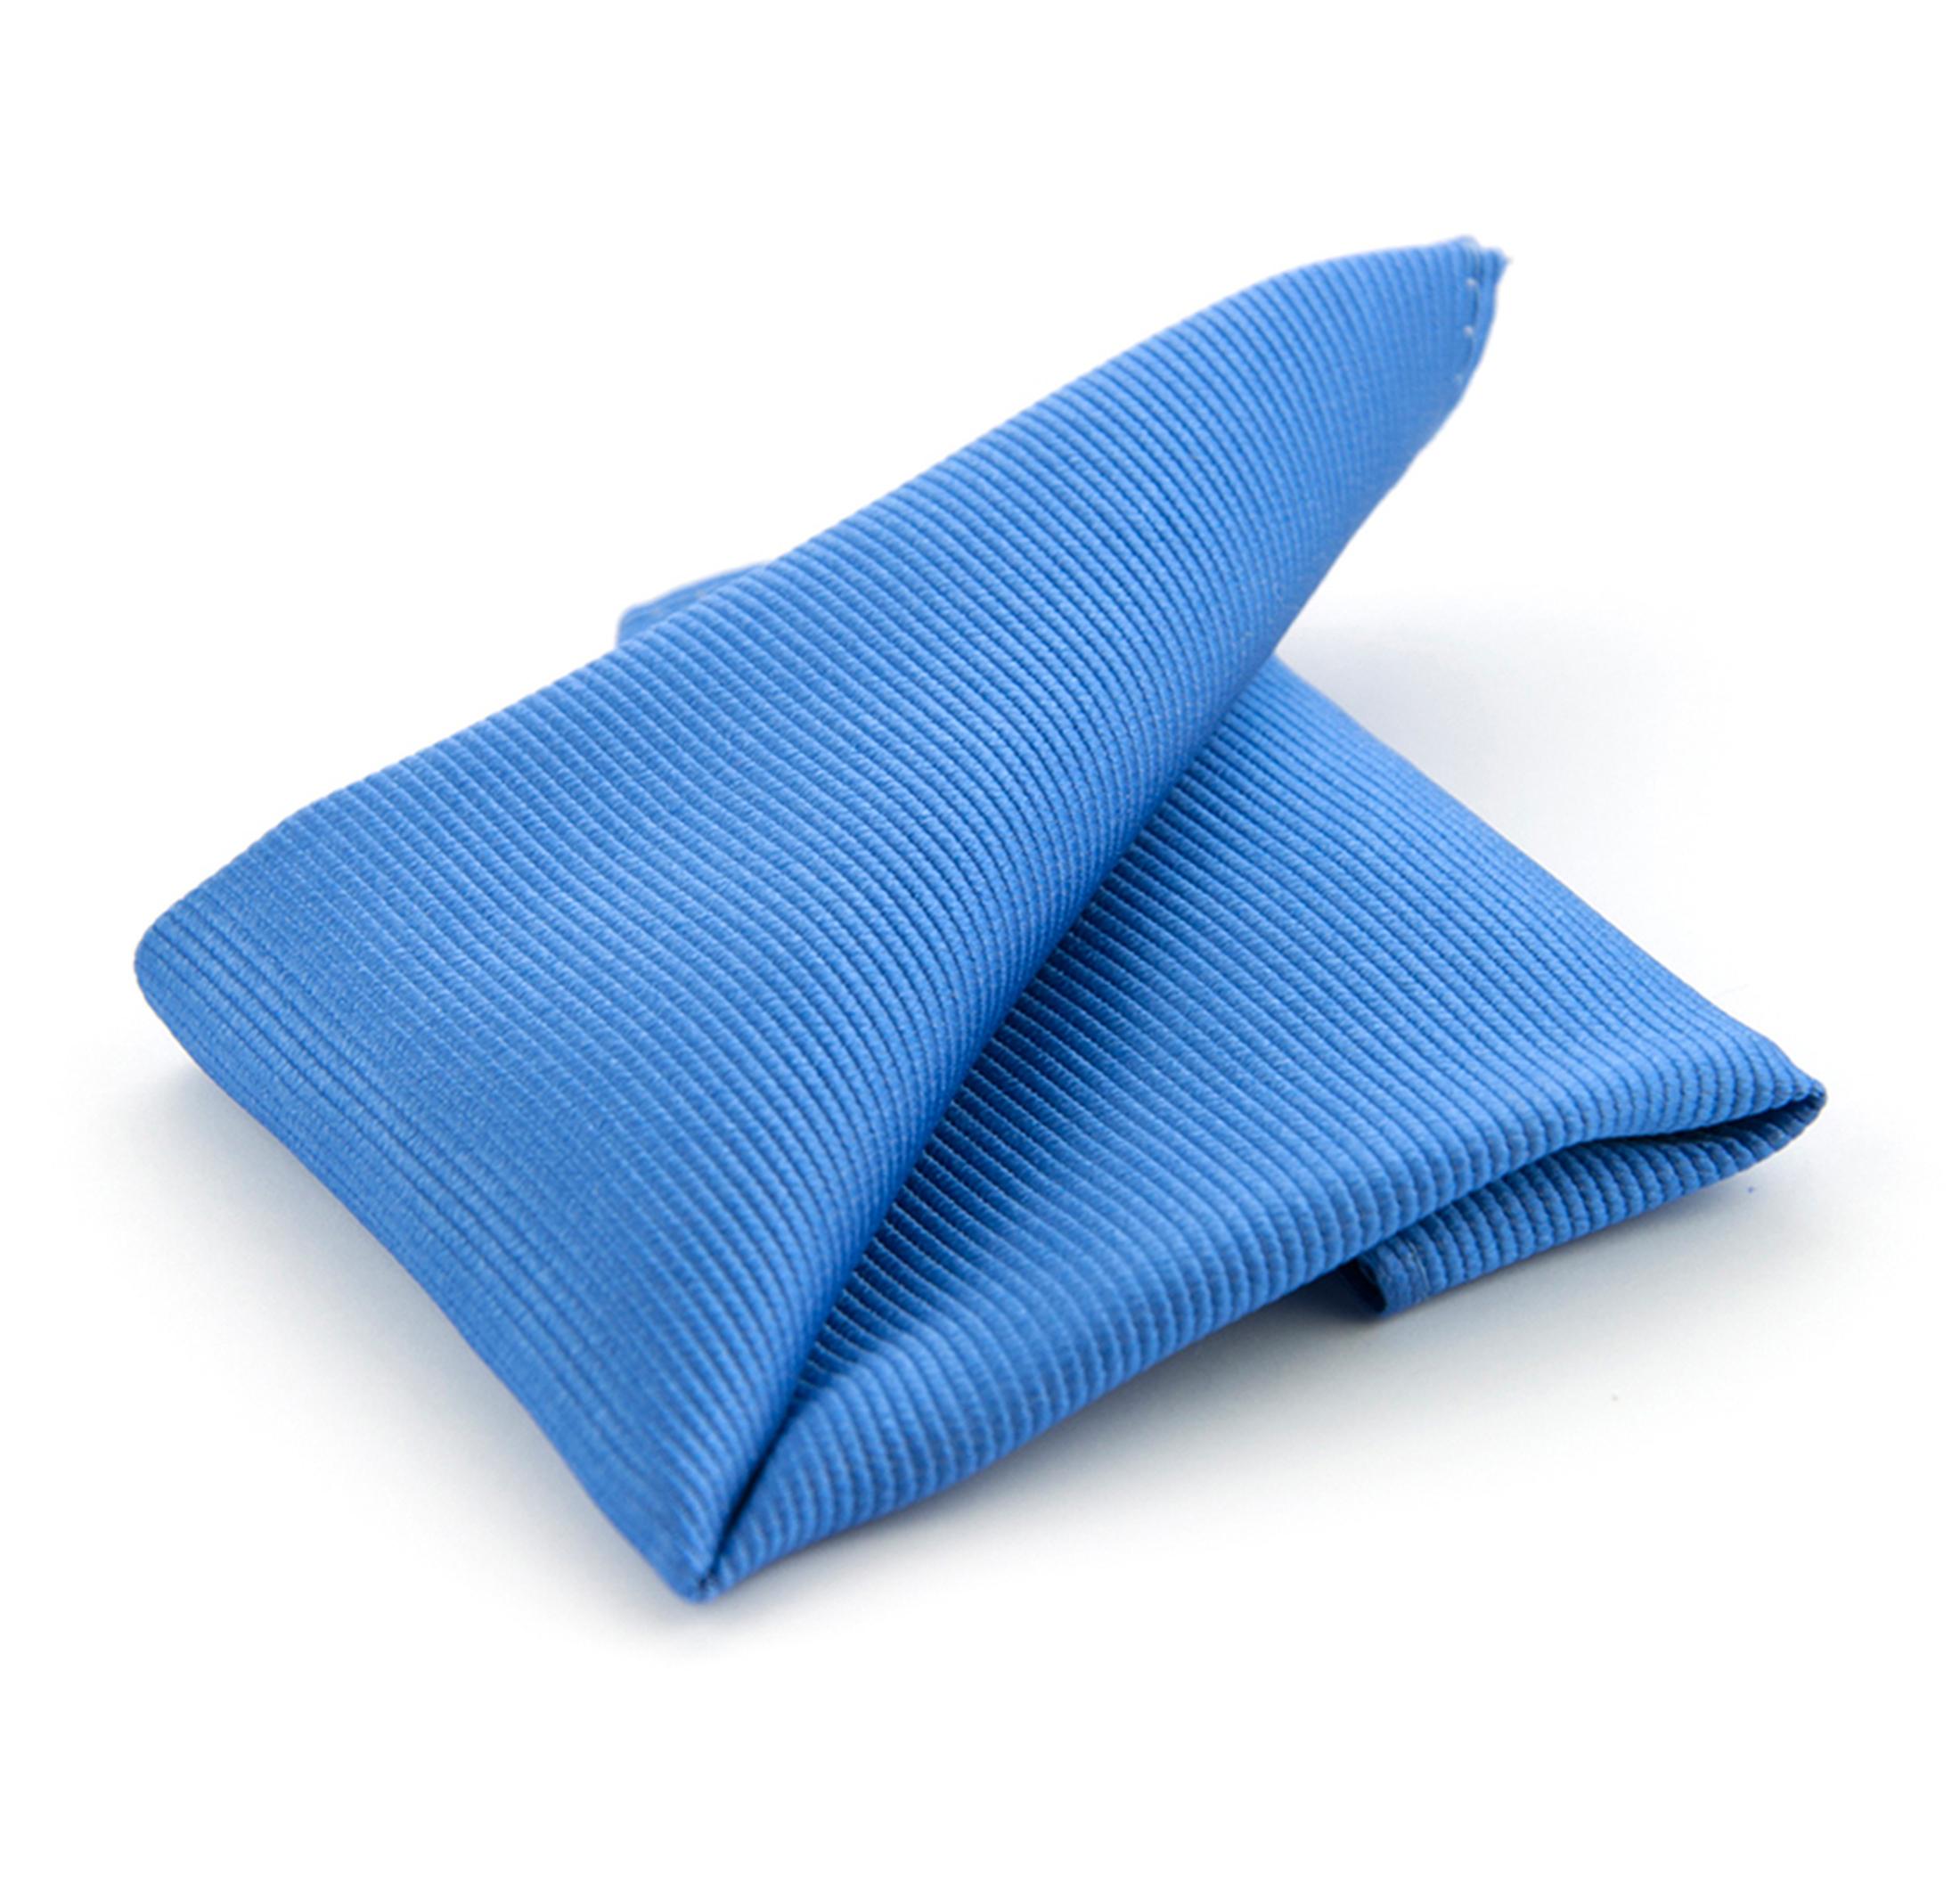 Einstecktuch Seide Königsblau F05